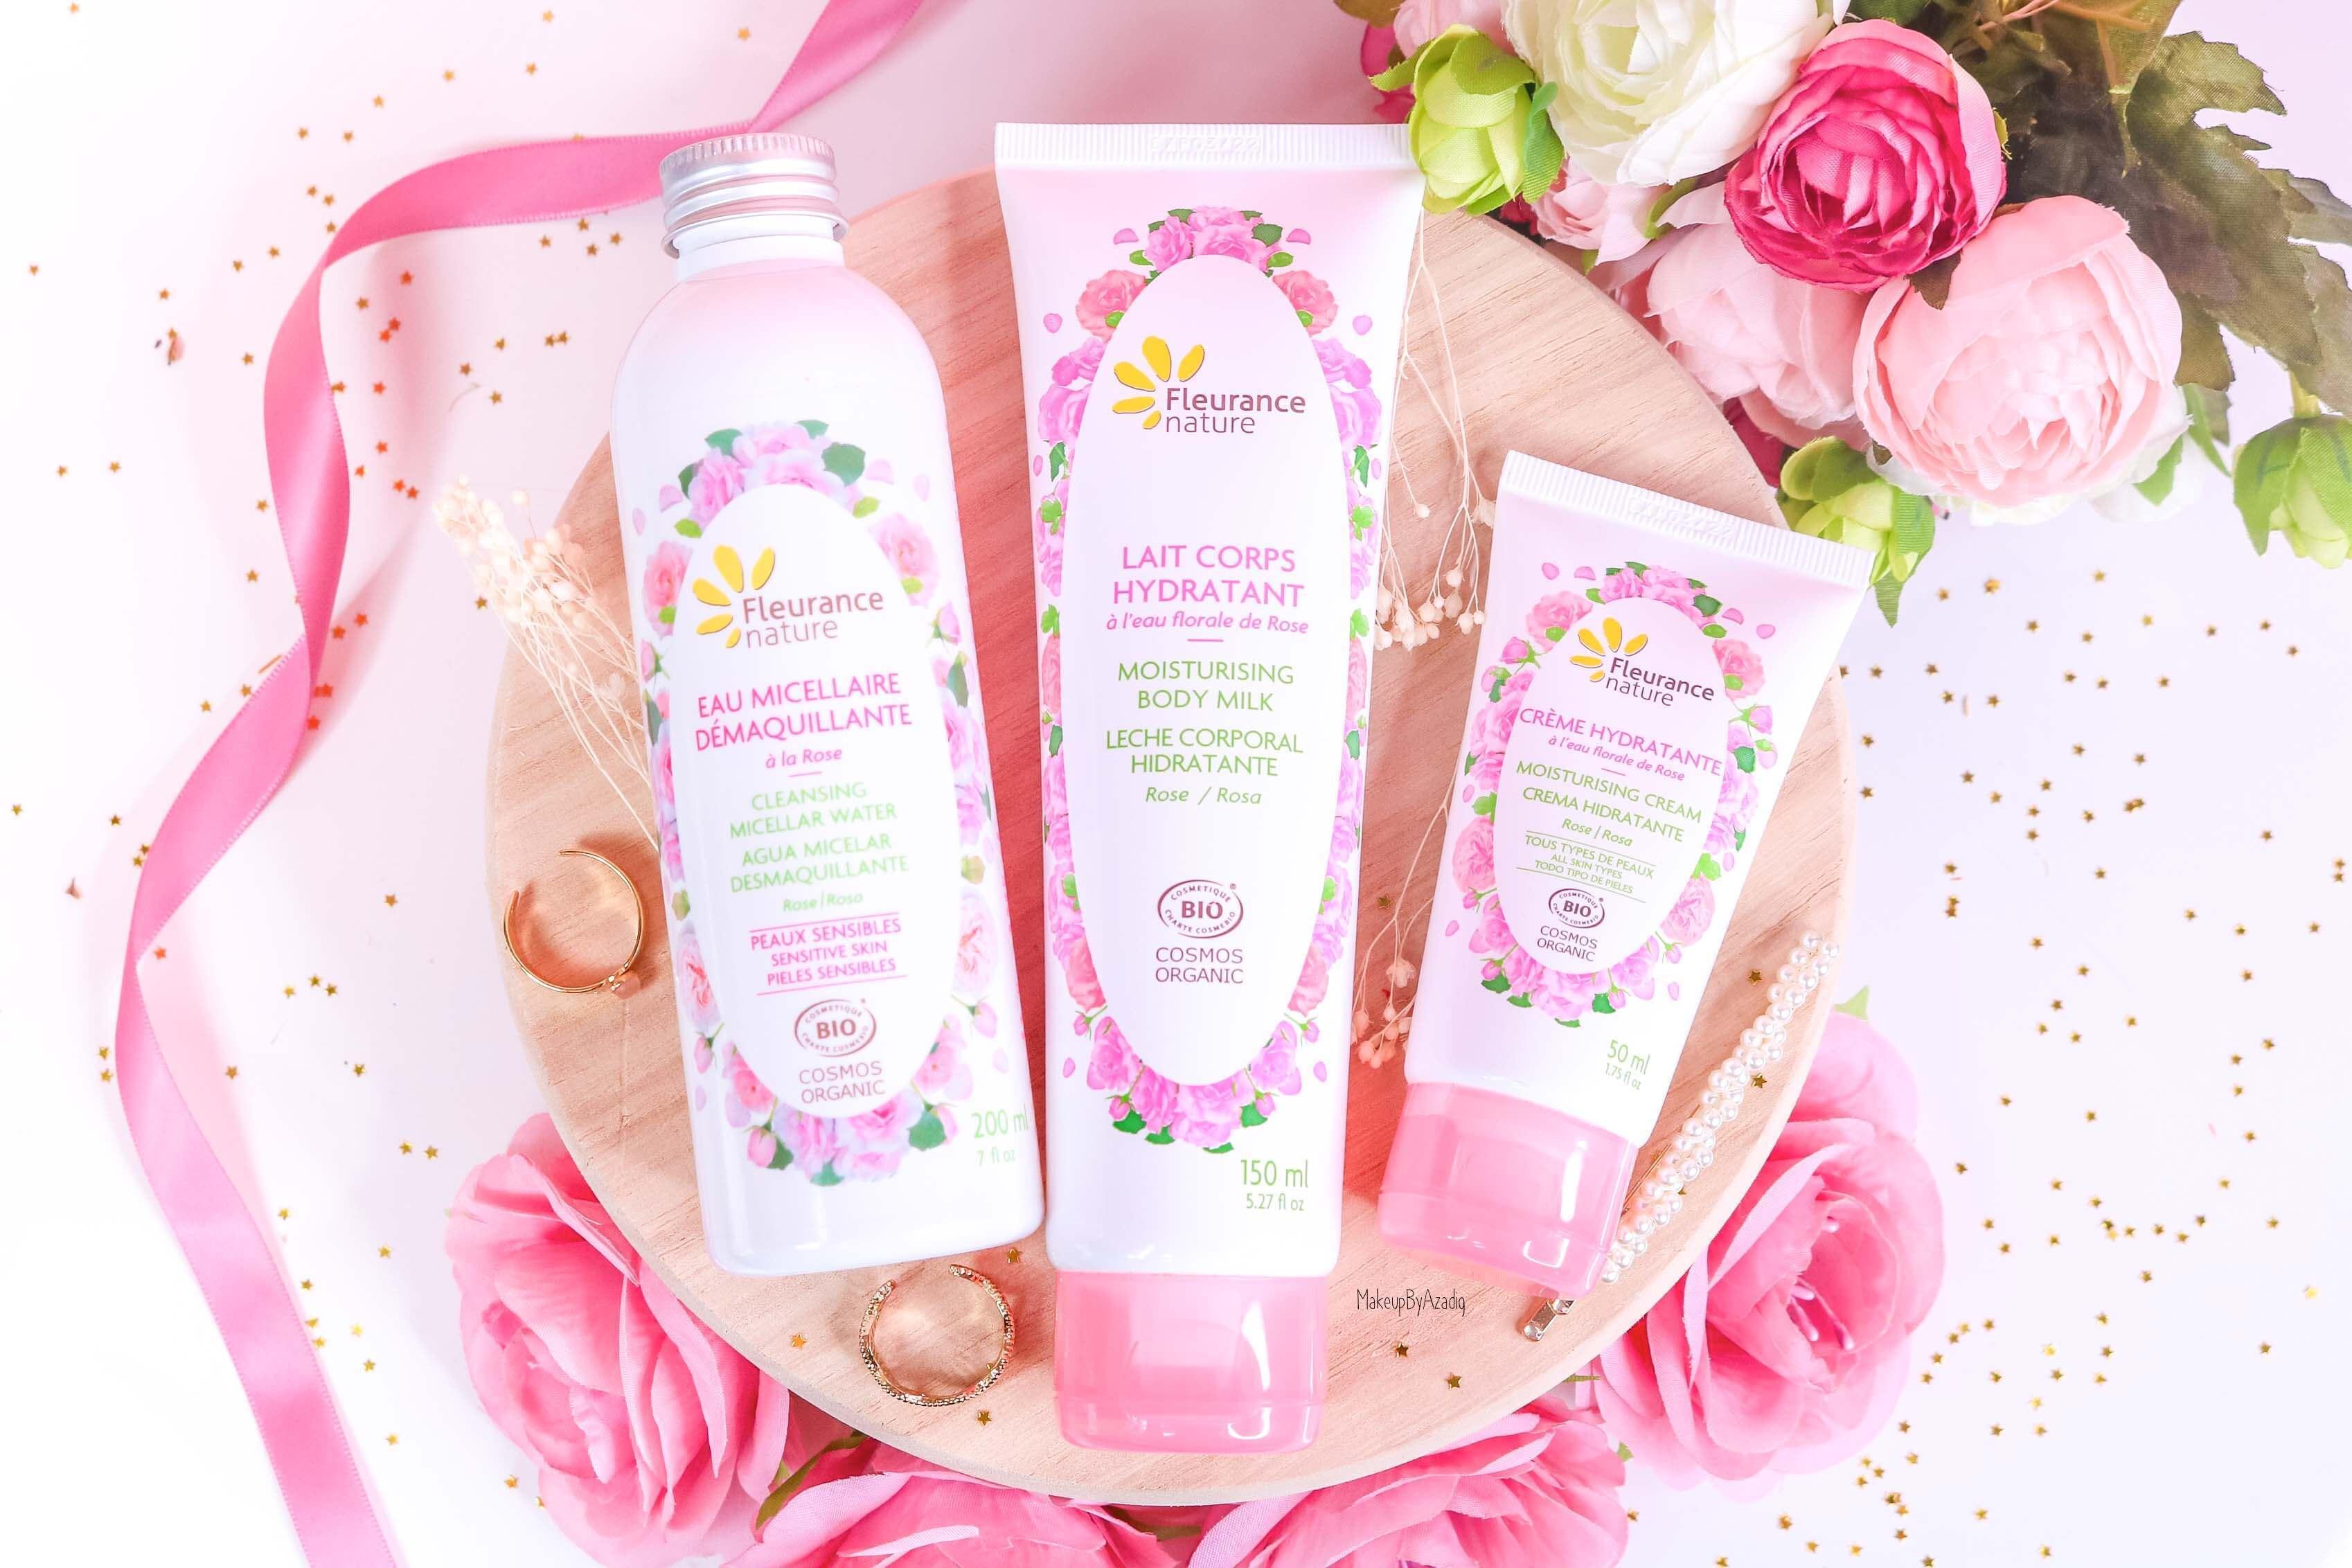 revue-produit-corps-visage-rose-fleurance-nature-hydratant-bio-cosmos-organic-avis-prix-makeupbyazadig-eau-micellaire-certifie